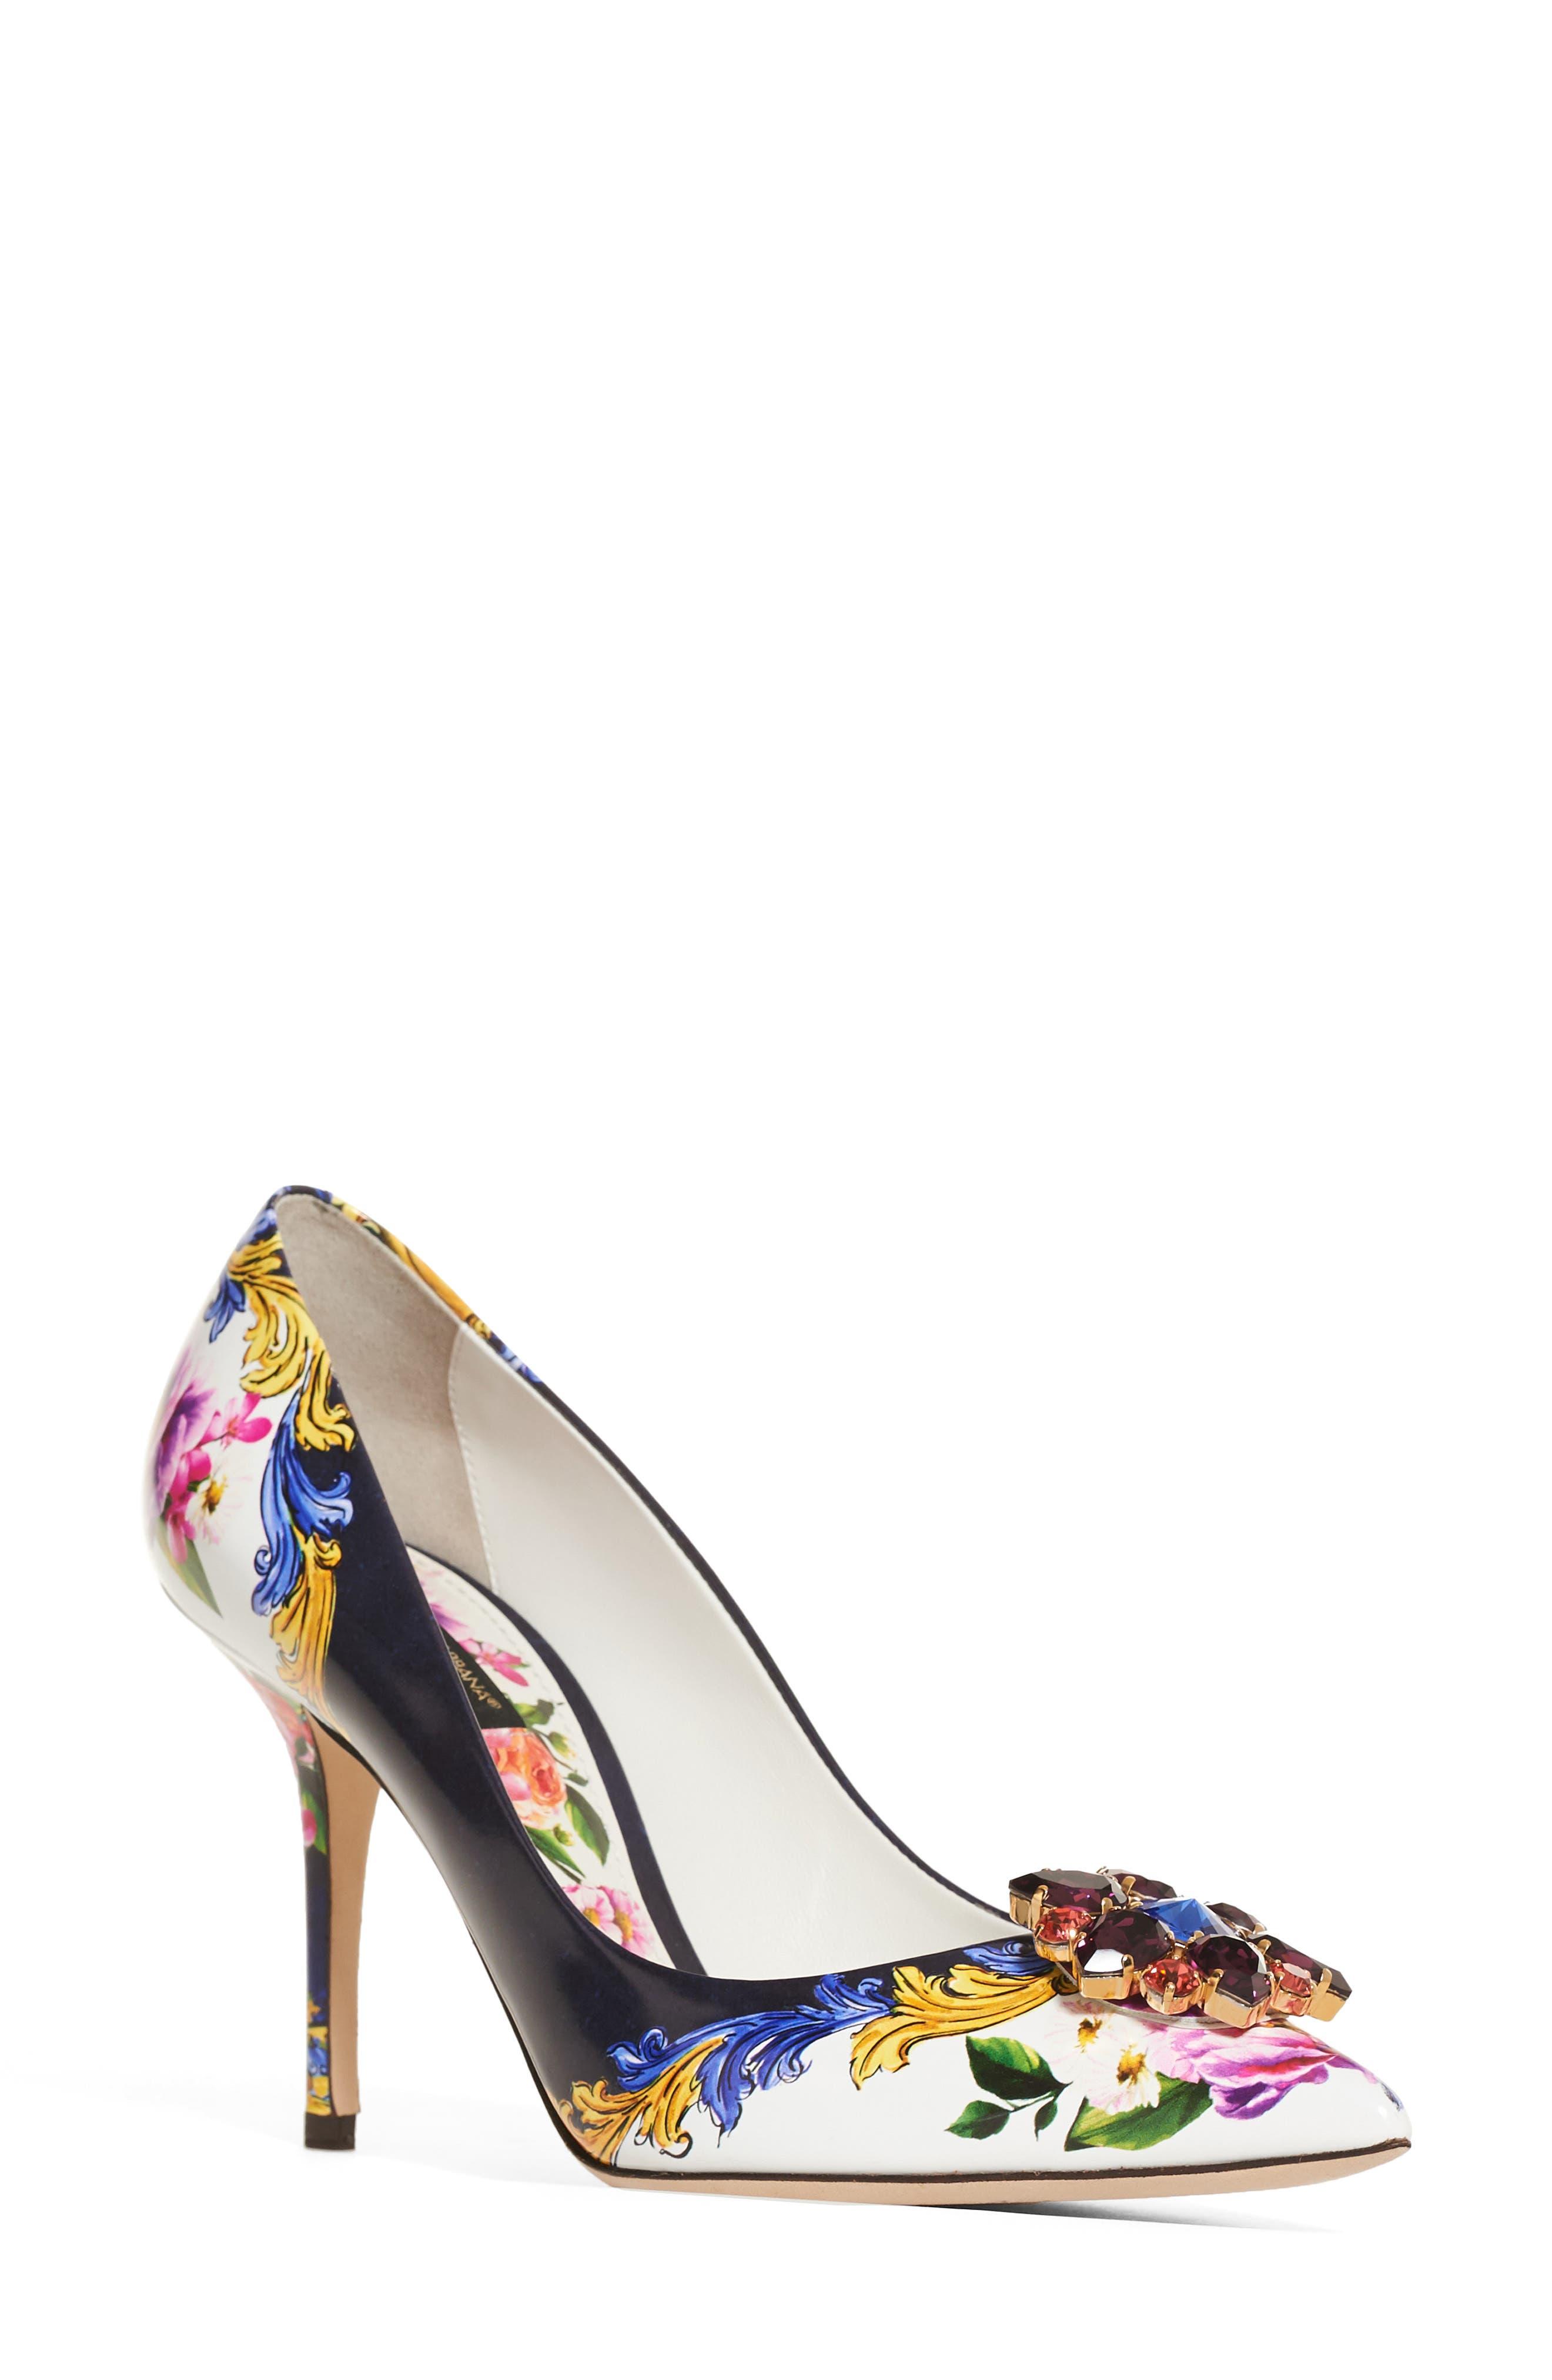 Dolce & Gabbana Print Pump,                         Main,                         color, 410